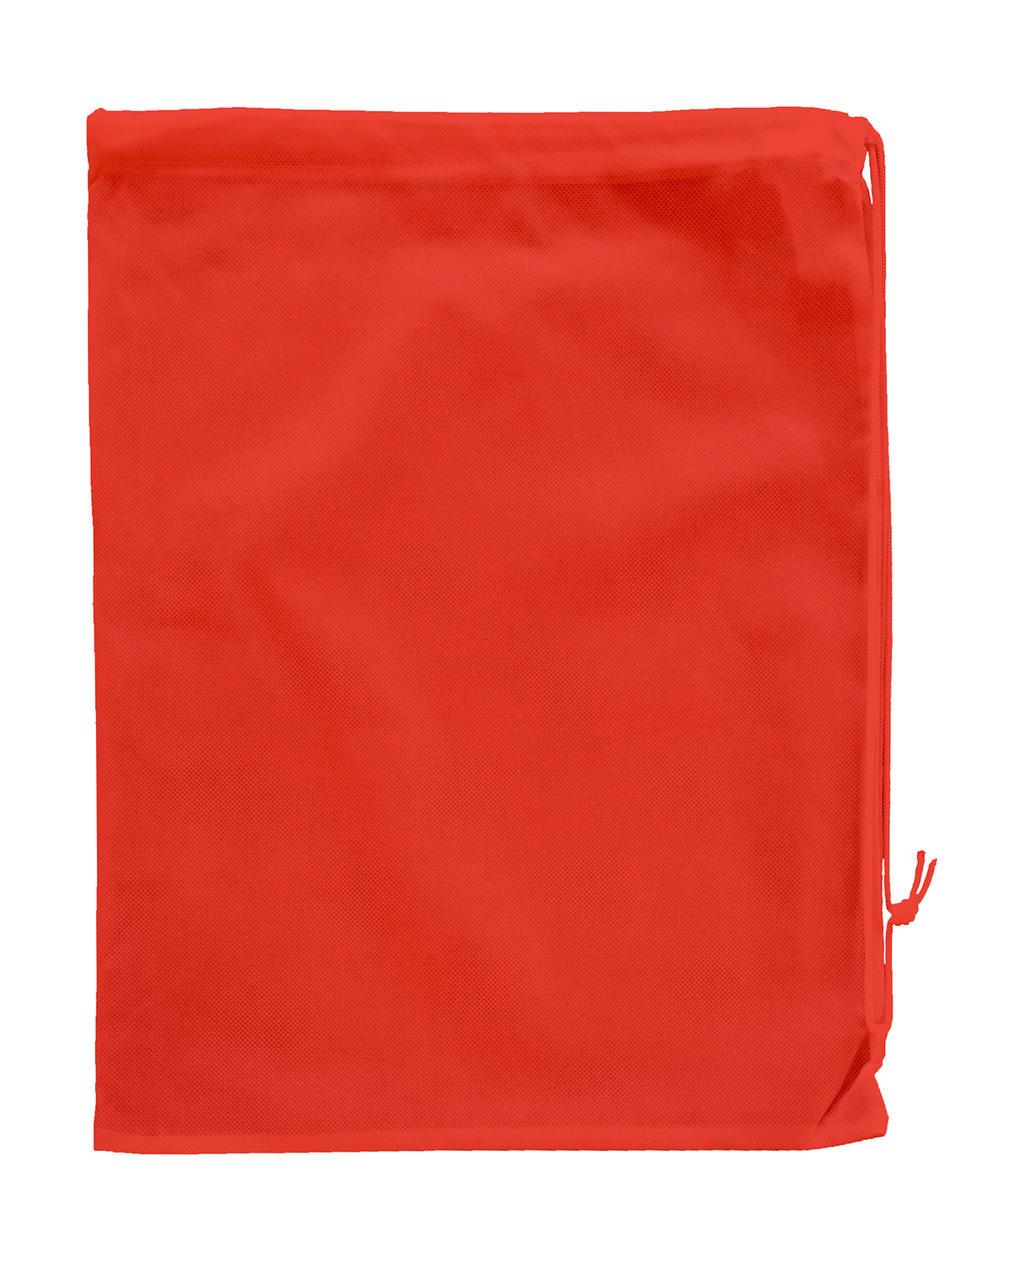 Stahovací taška pøes rameno - zvìtšit obrázek